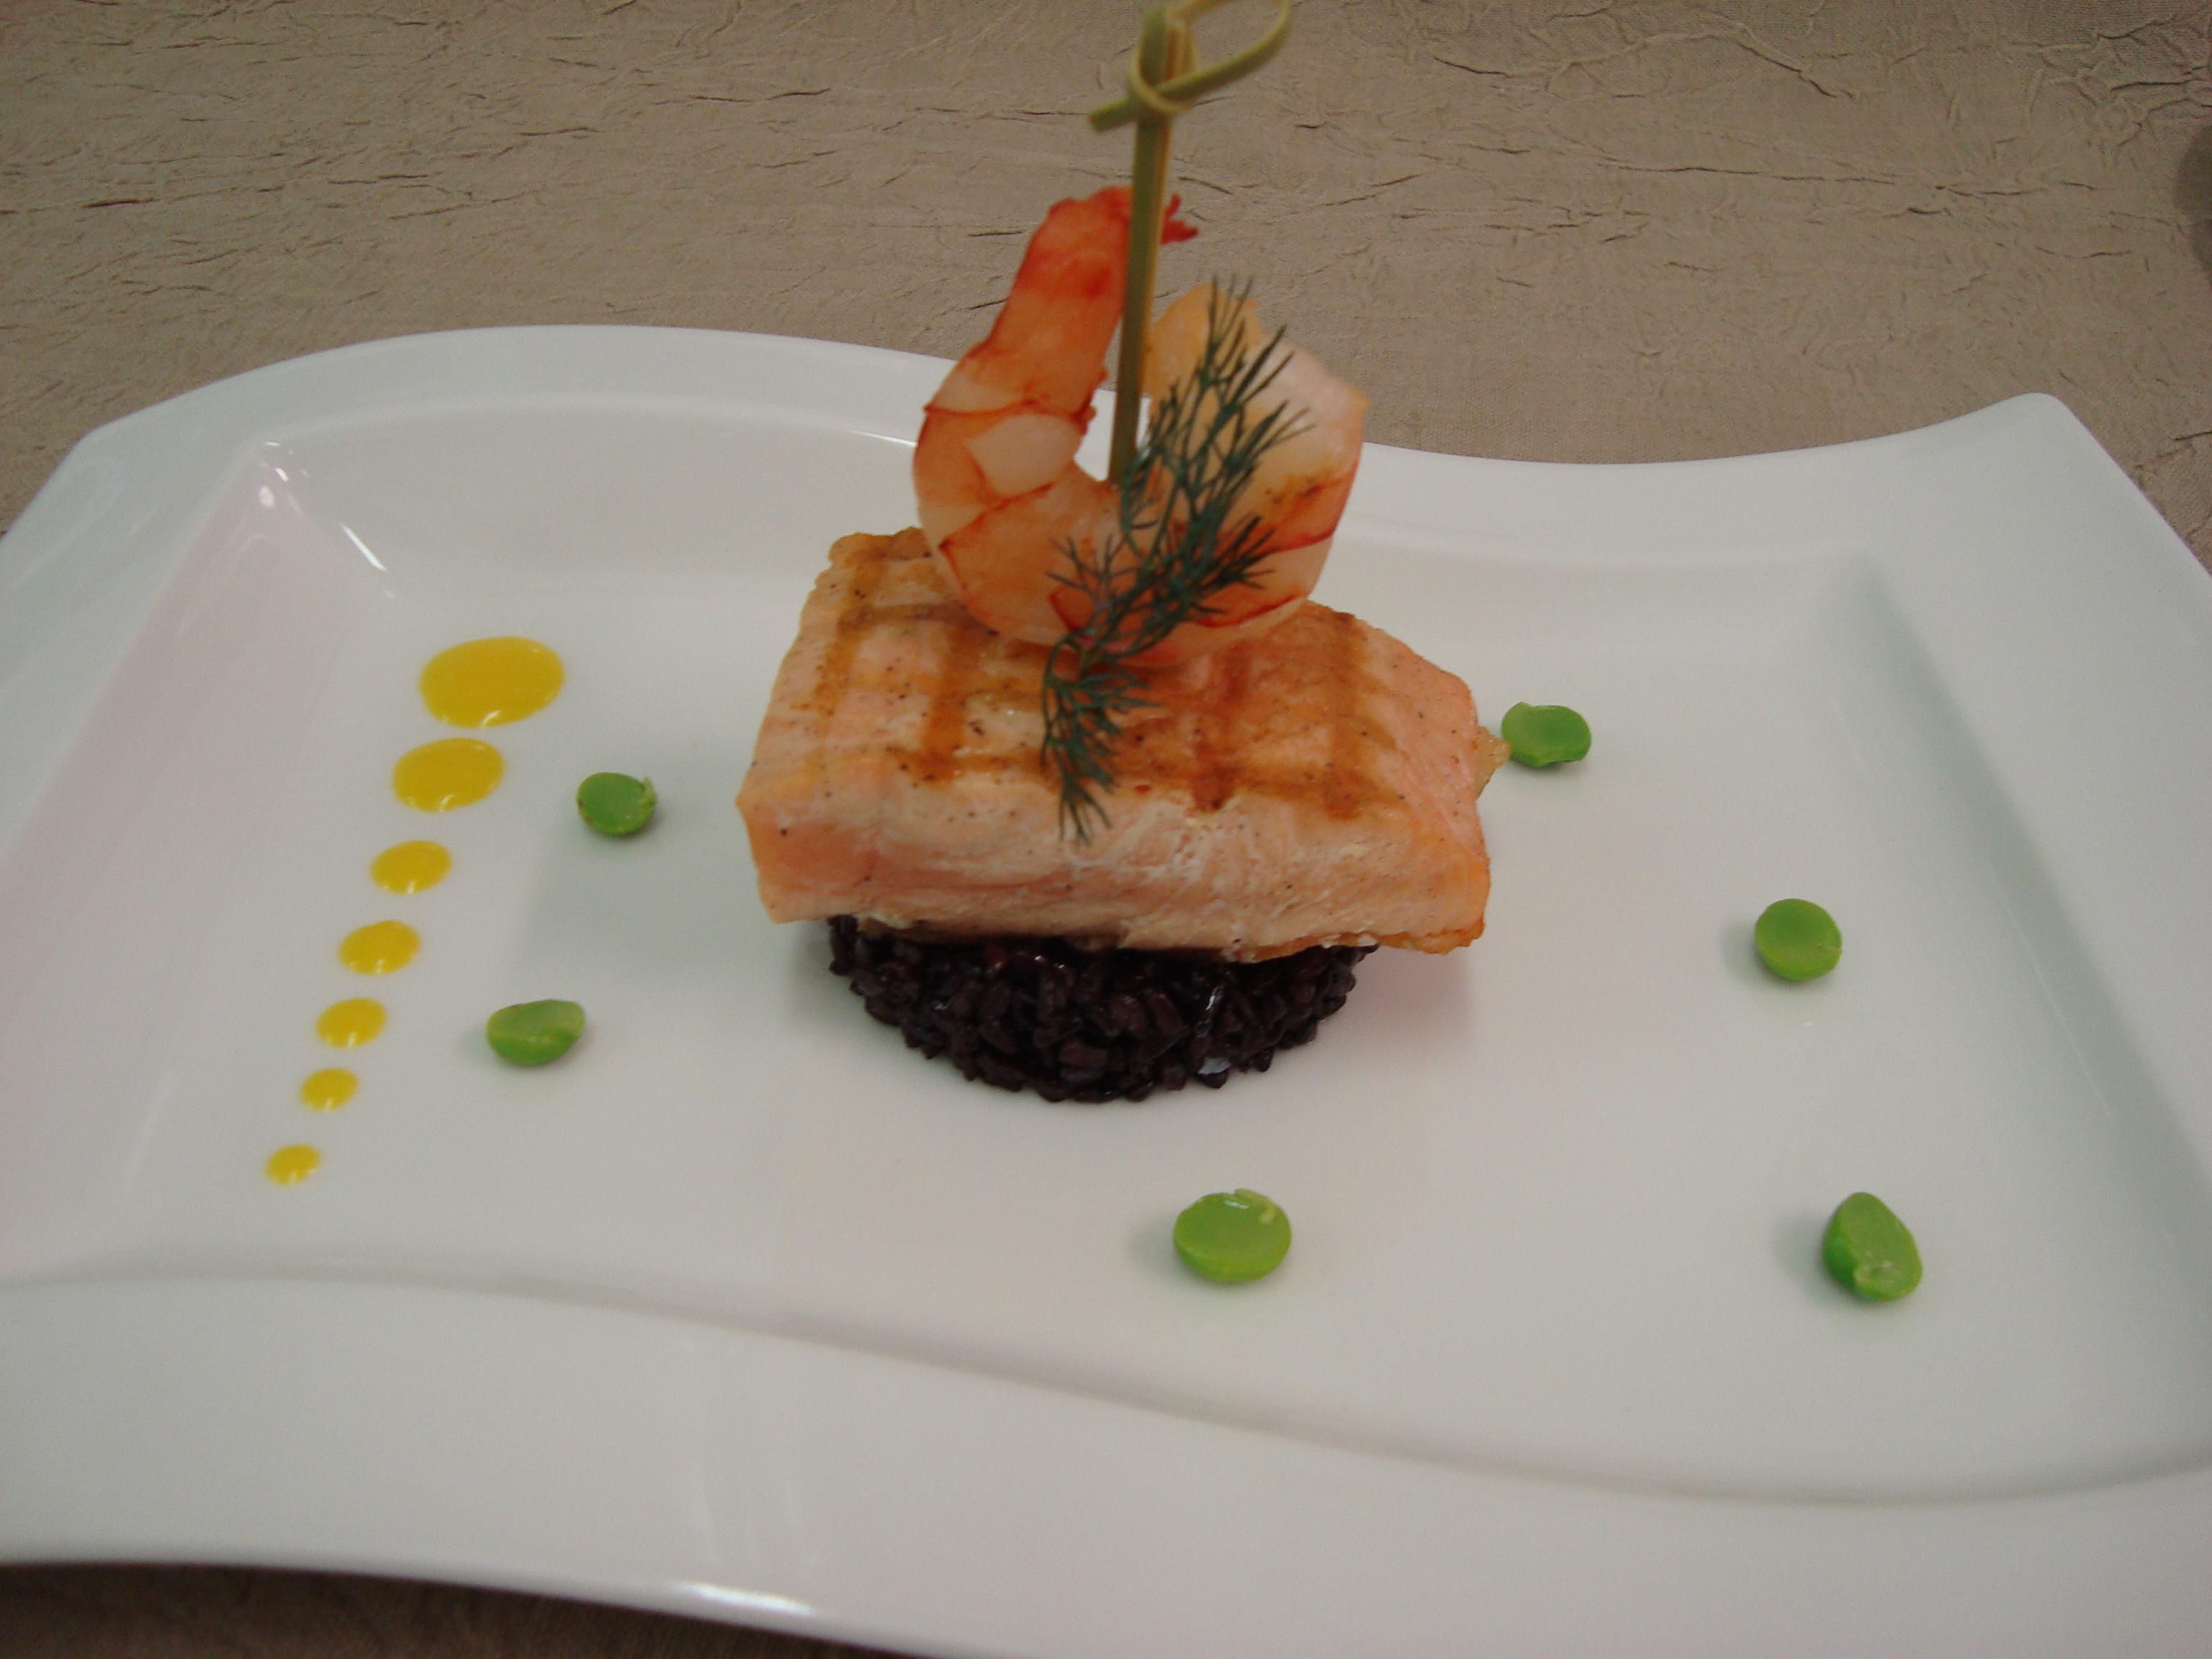 presentations of food